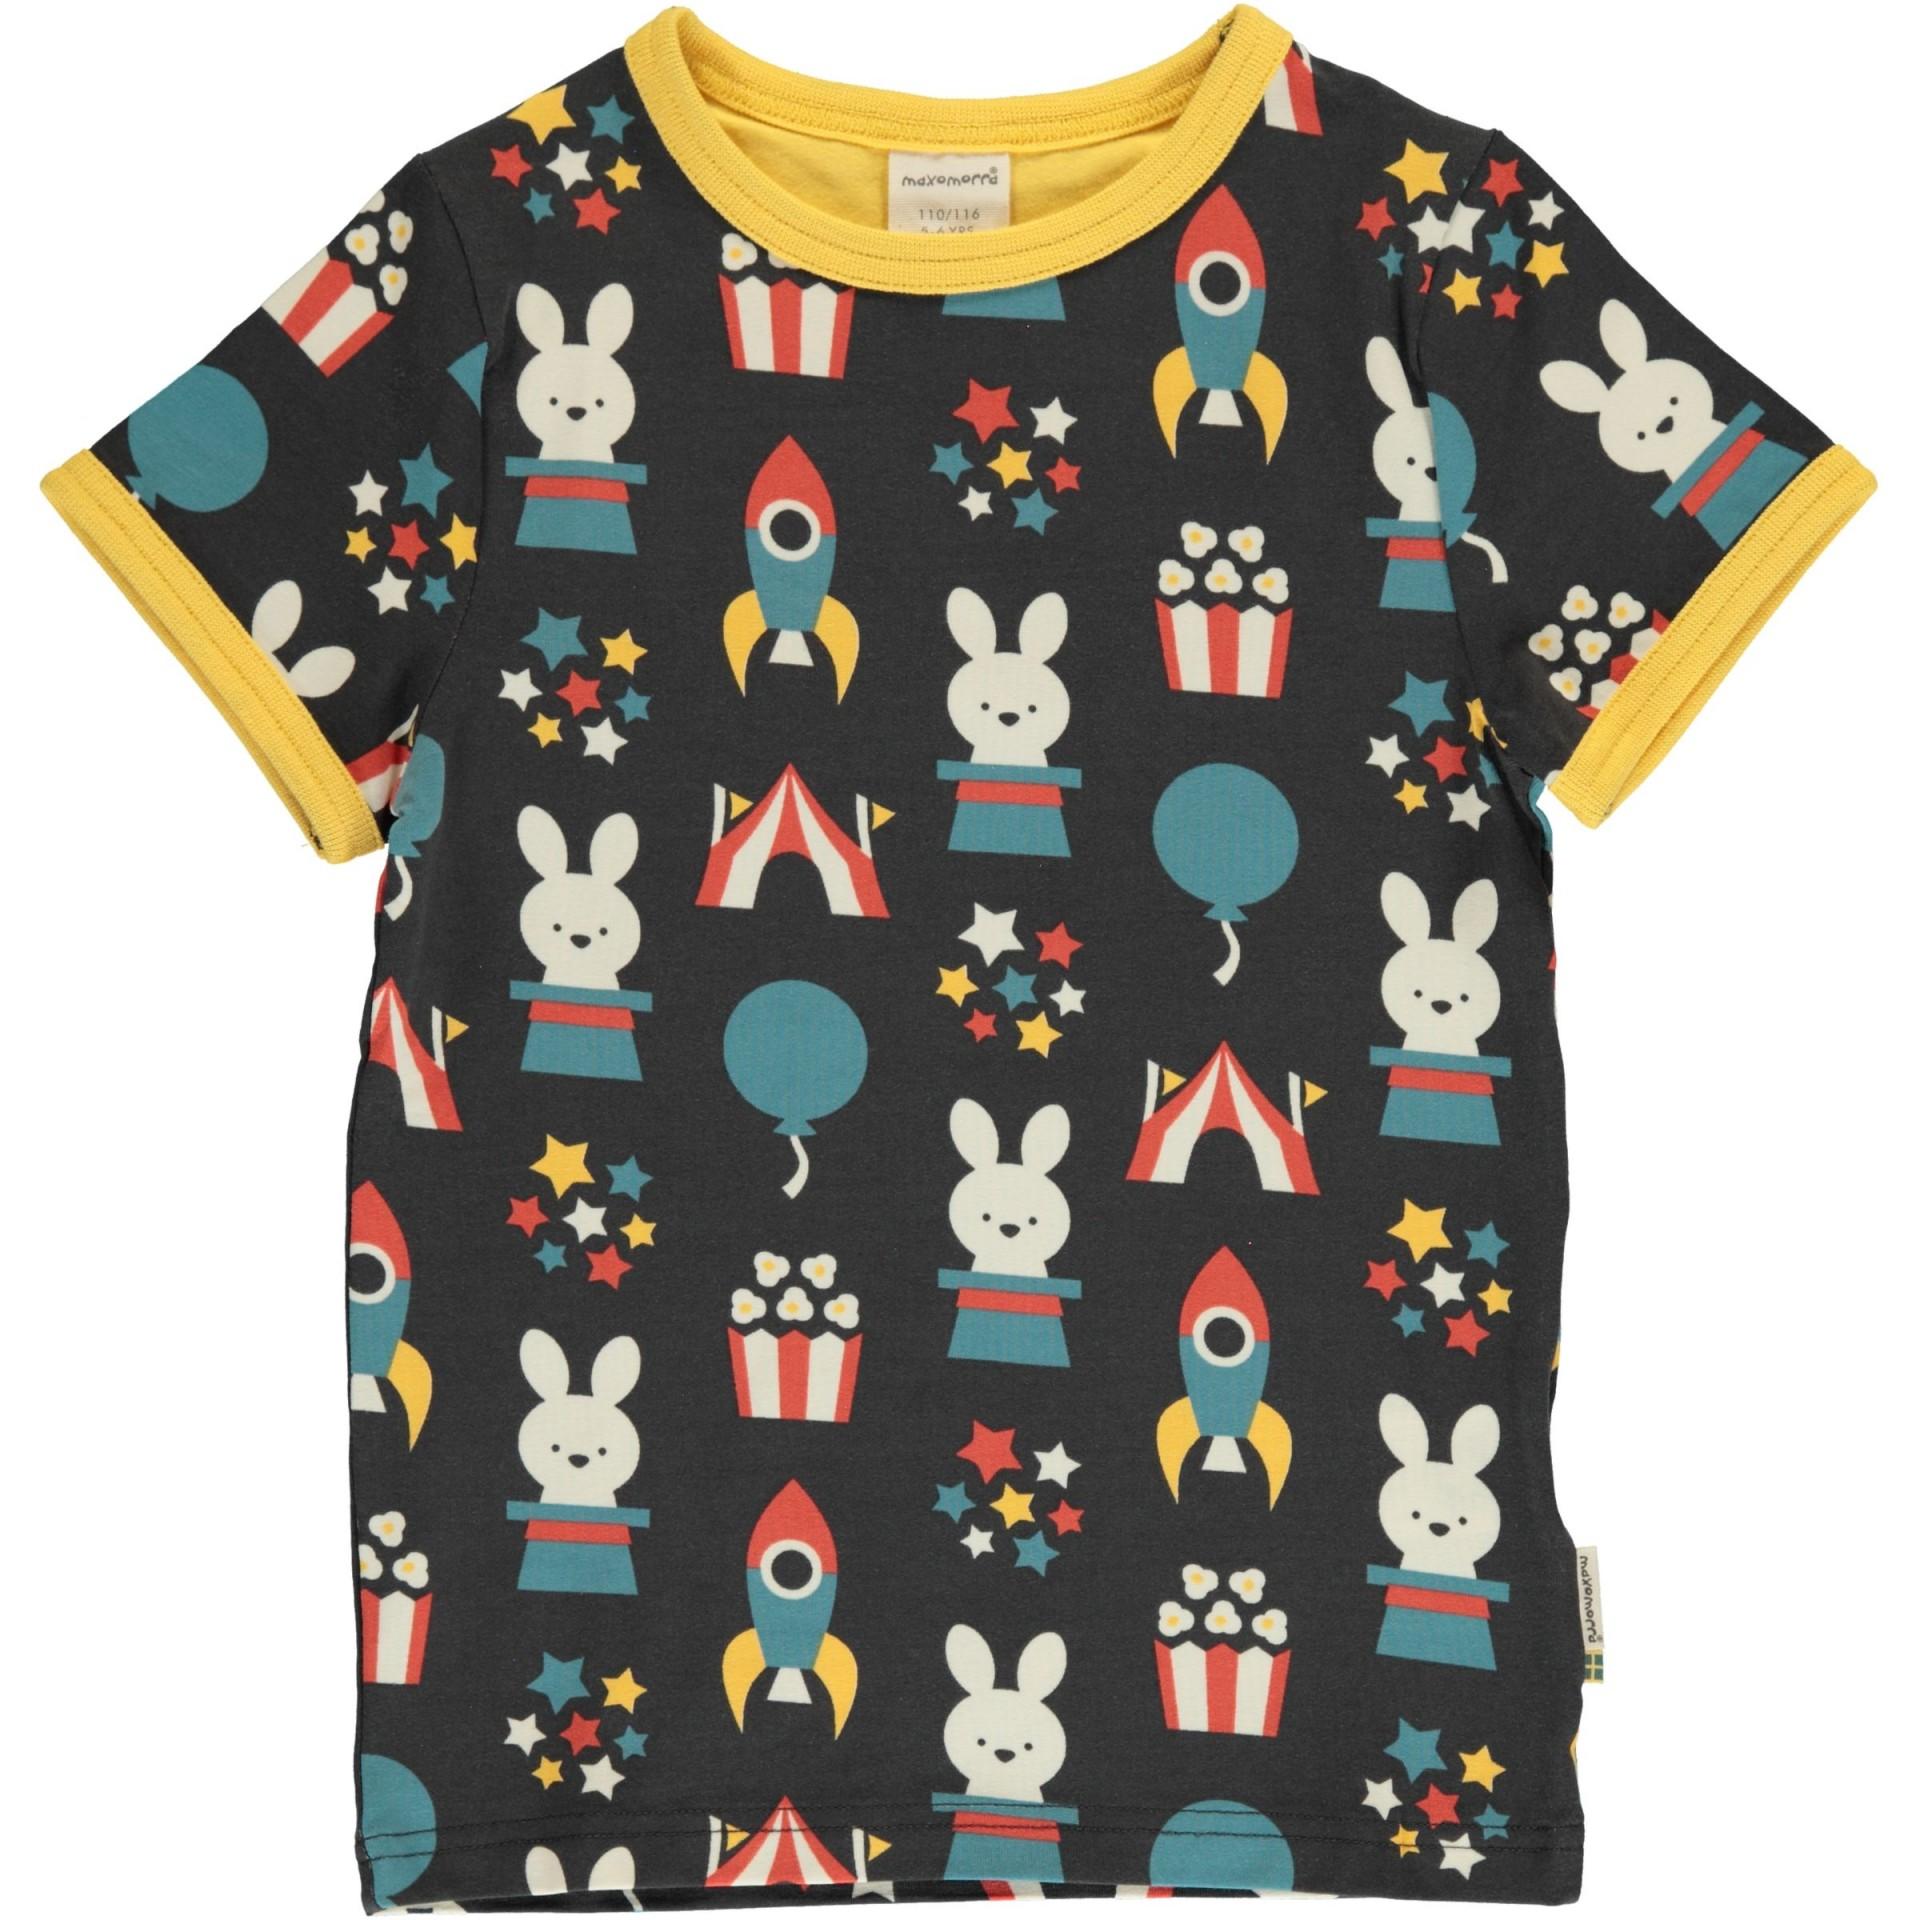 T-shirt Fun Park Maxomorra (Tamanhos disponíveis 18-24m, 3-4a)